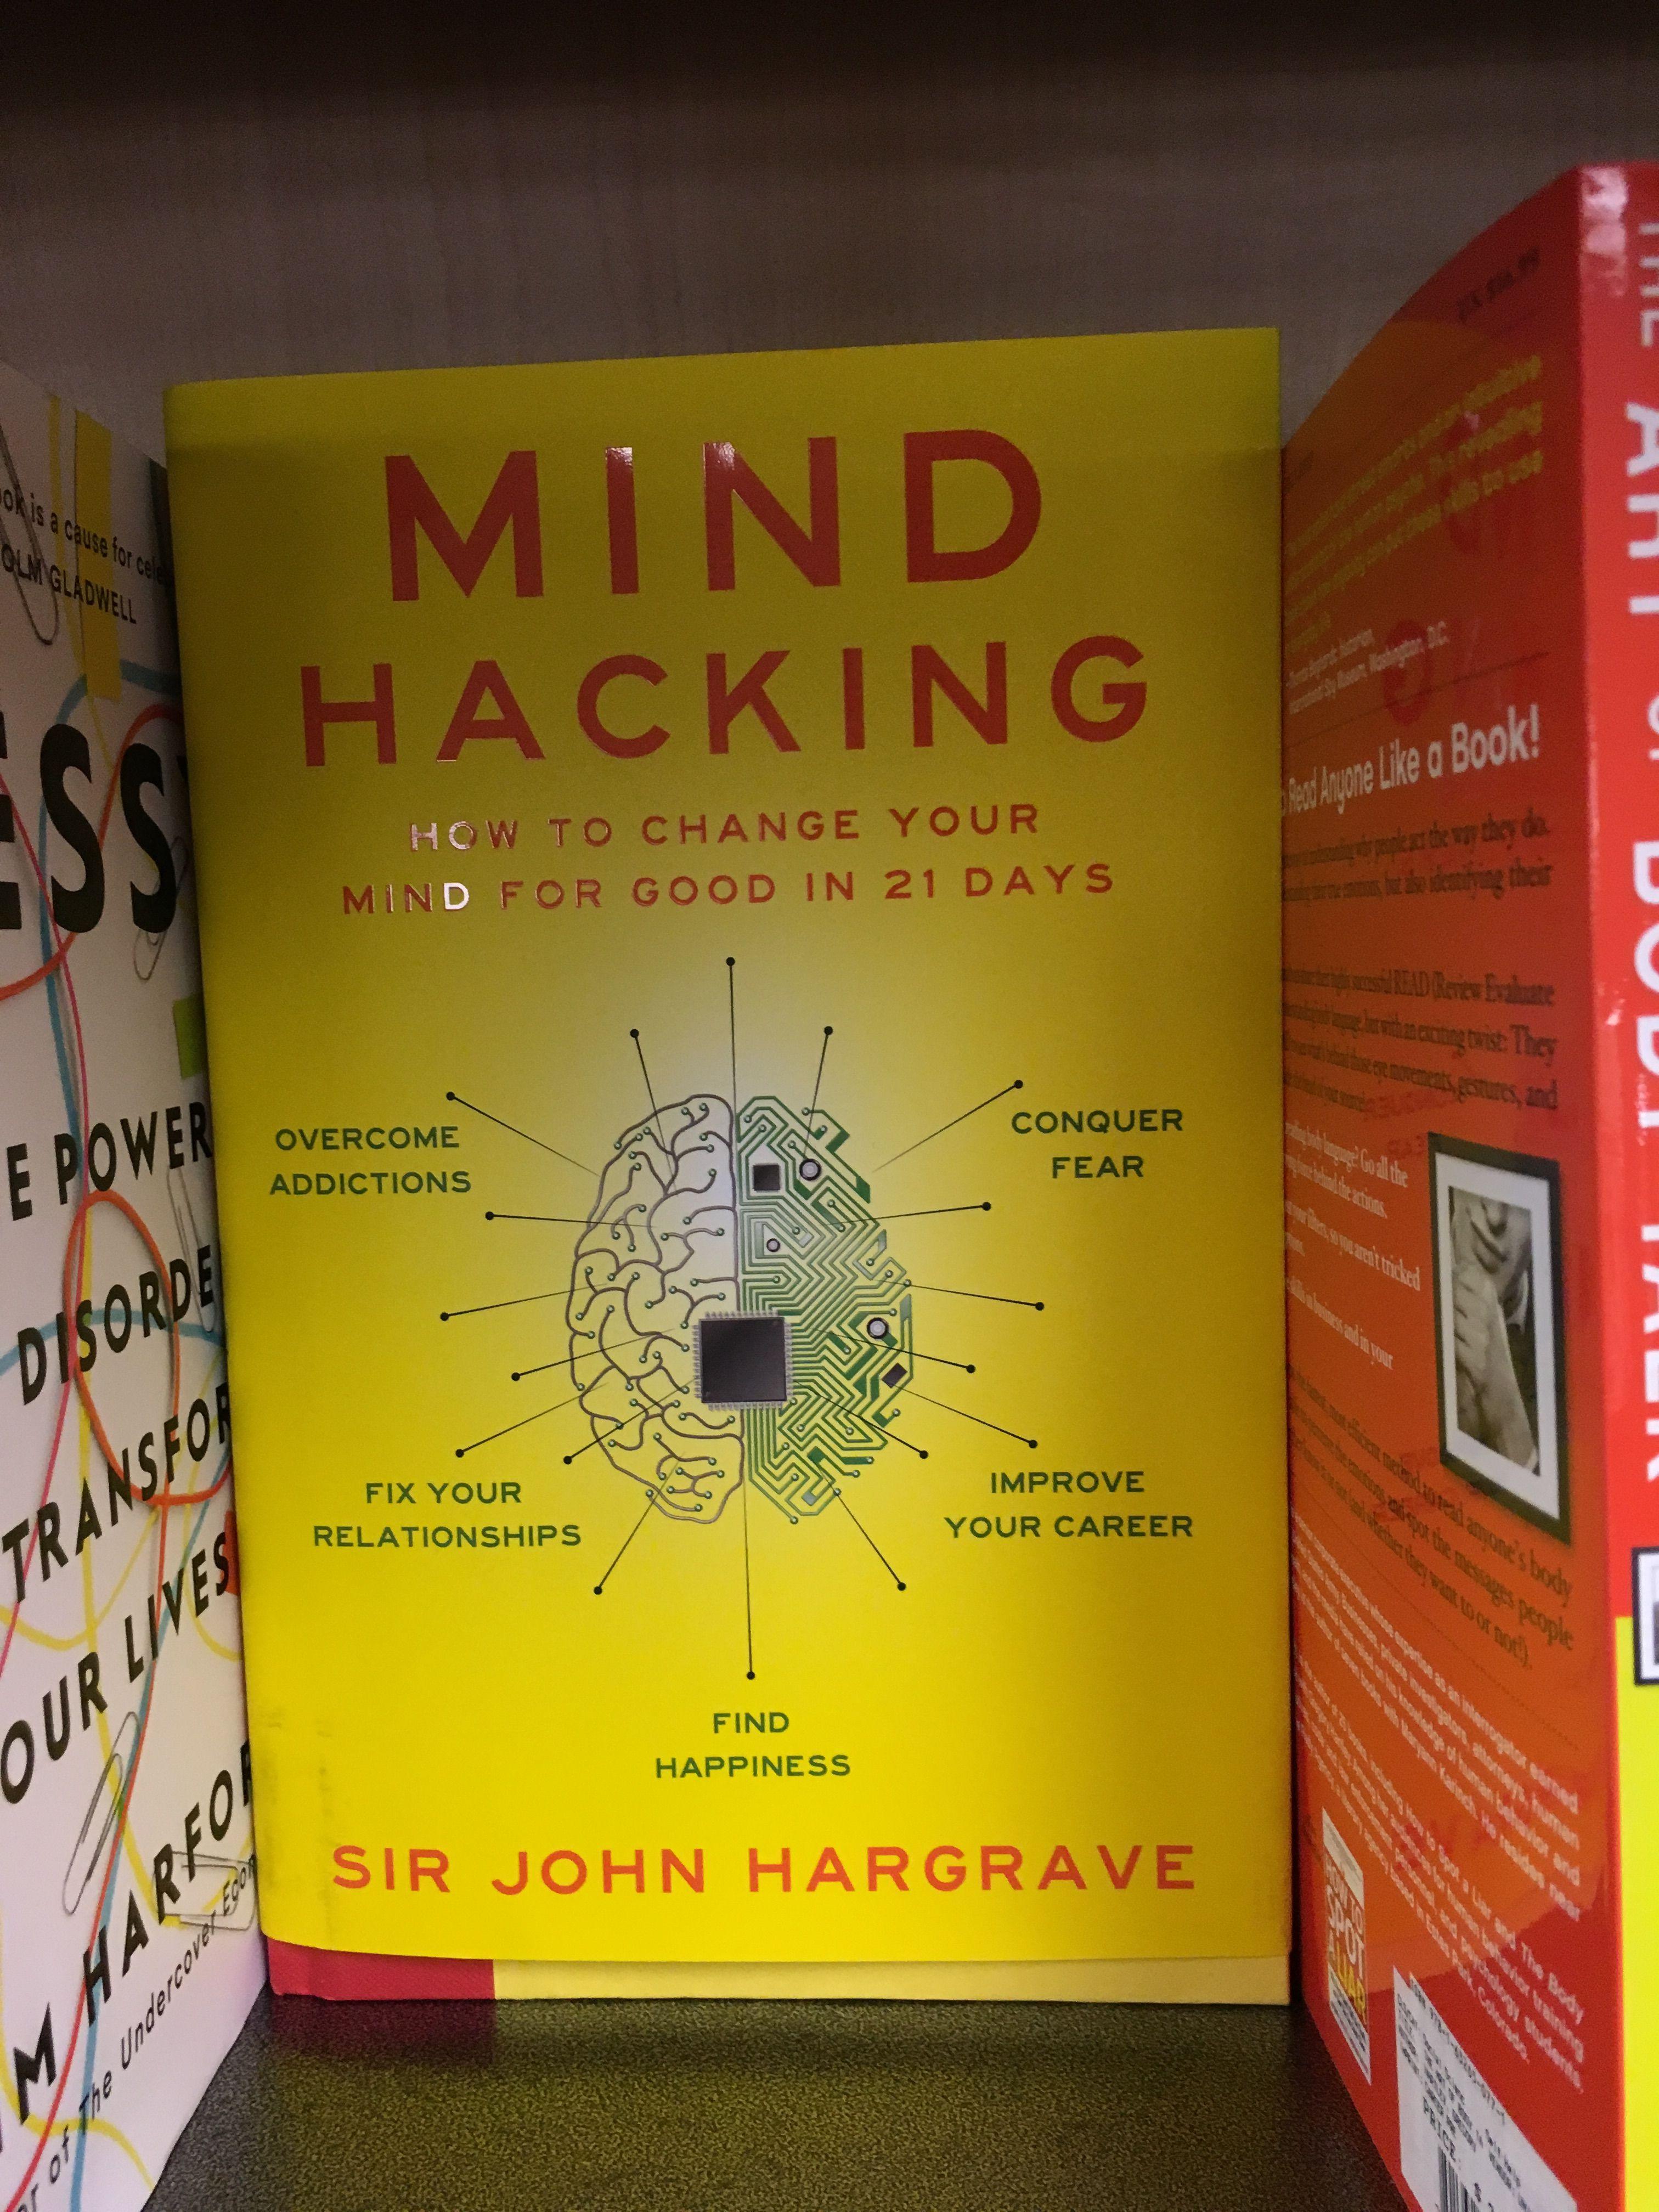 Psych Read Psychology Books Books Inspirational Books